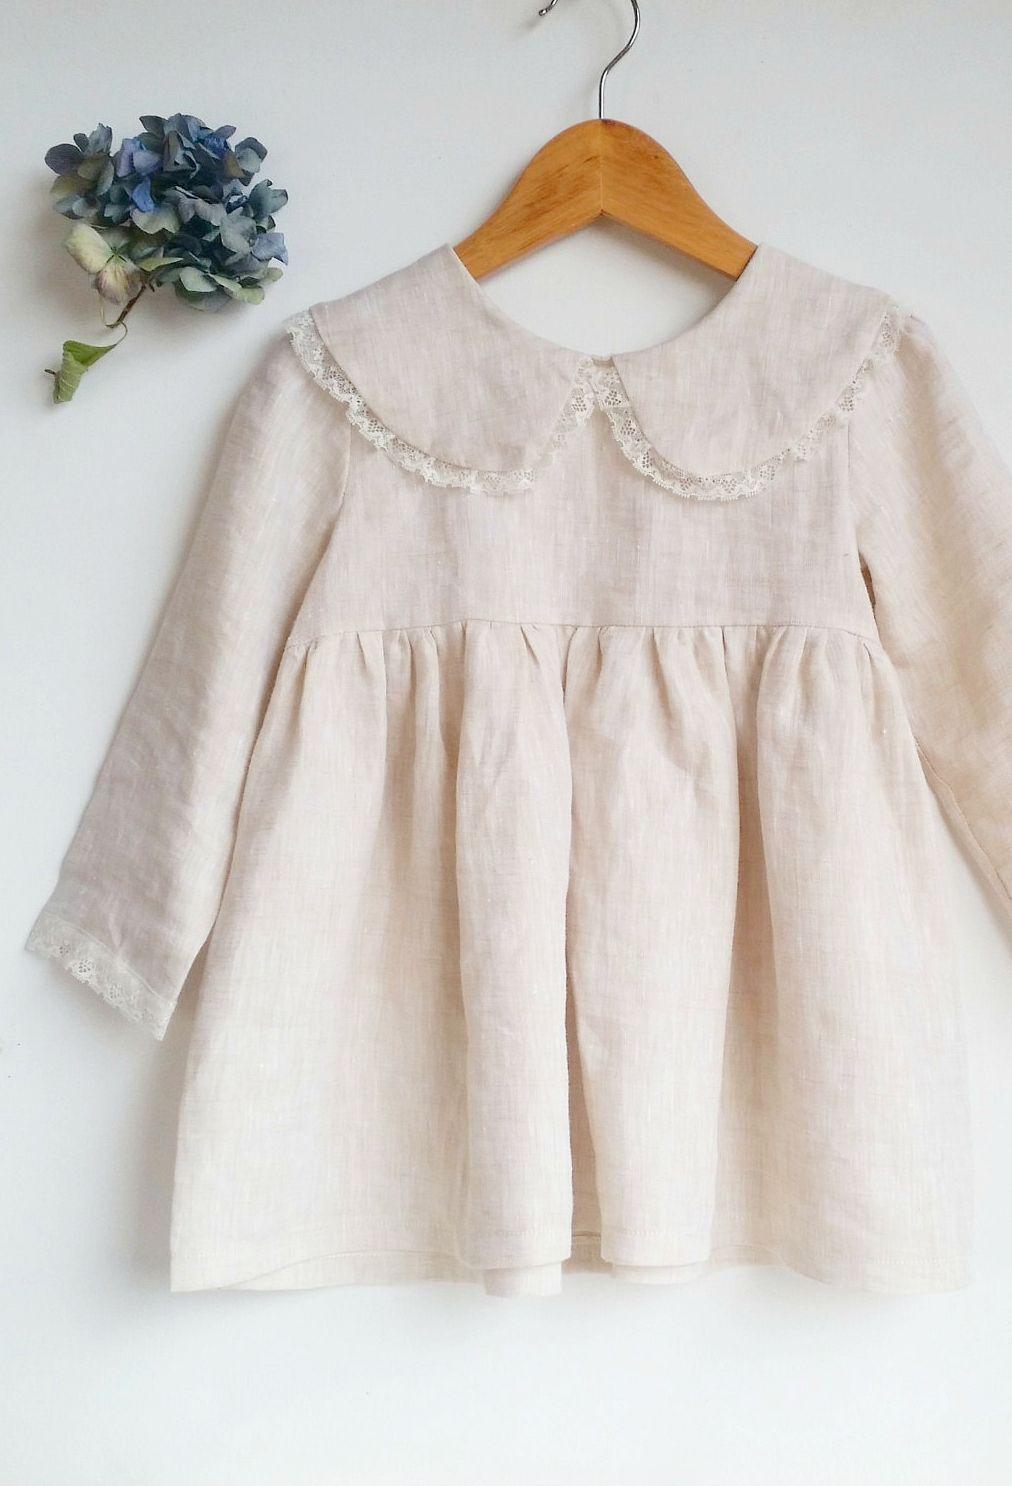 1c6eec03b6 Girls Handmade Linen   Lace Dress With Peter Pan Collar